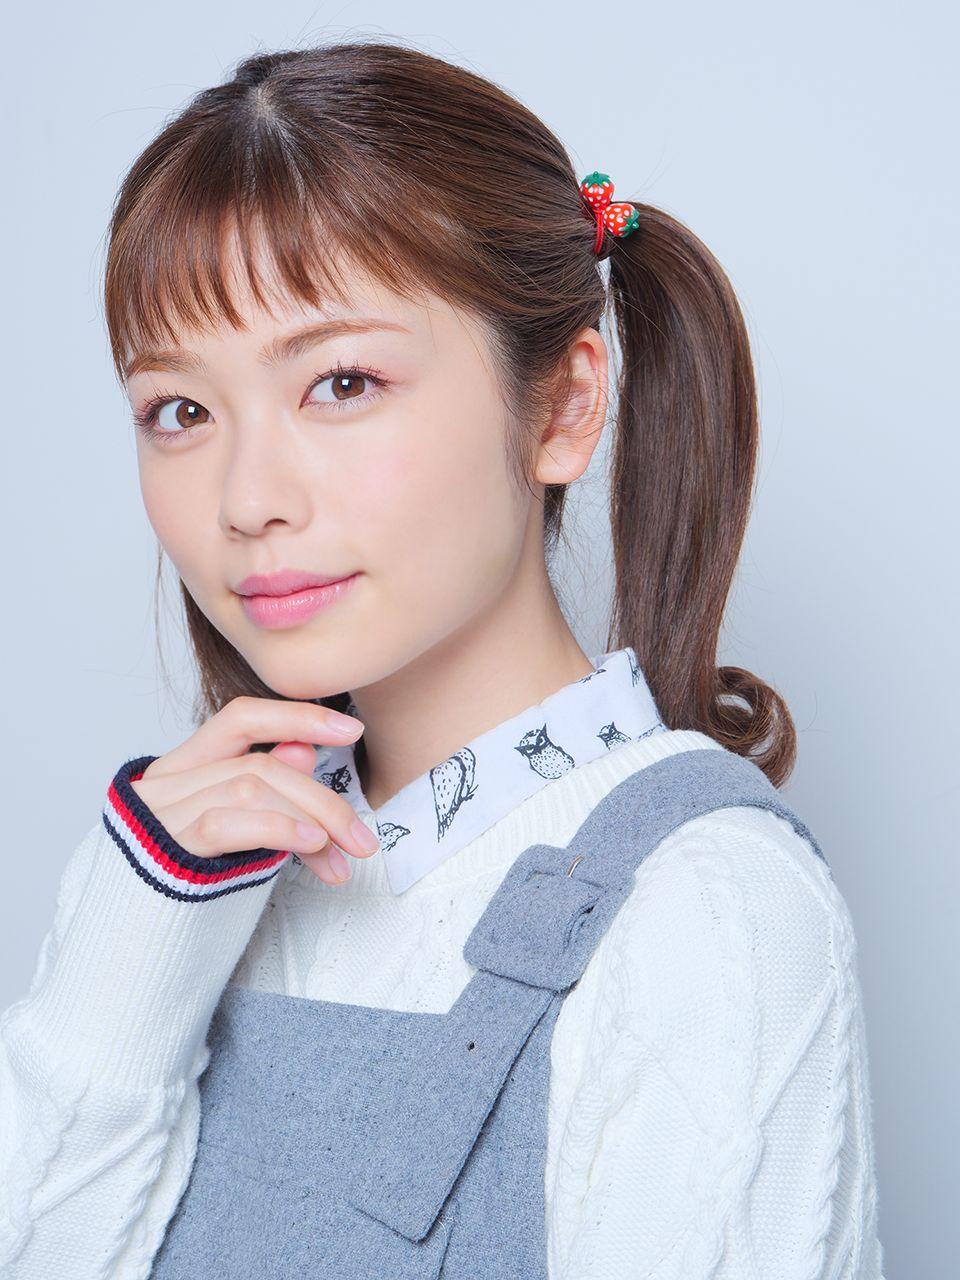 Pick Up Actress 小芝風花 Hustle Press Official Web Site